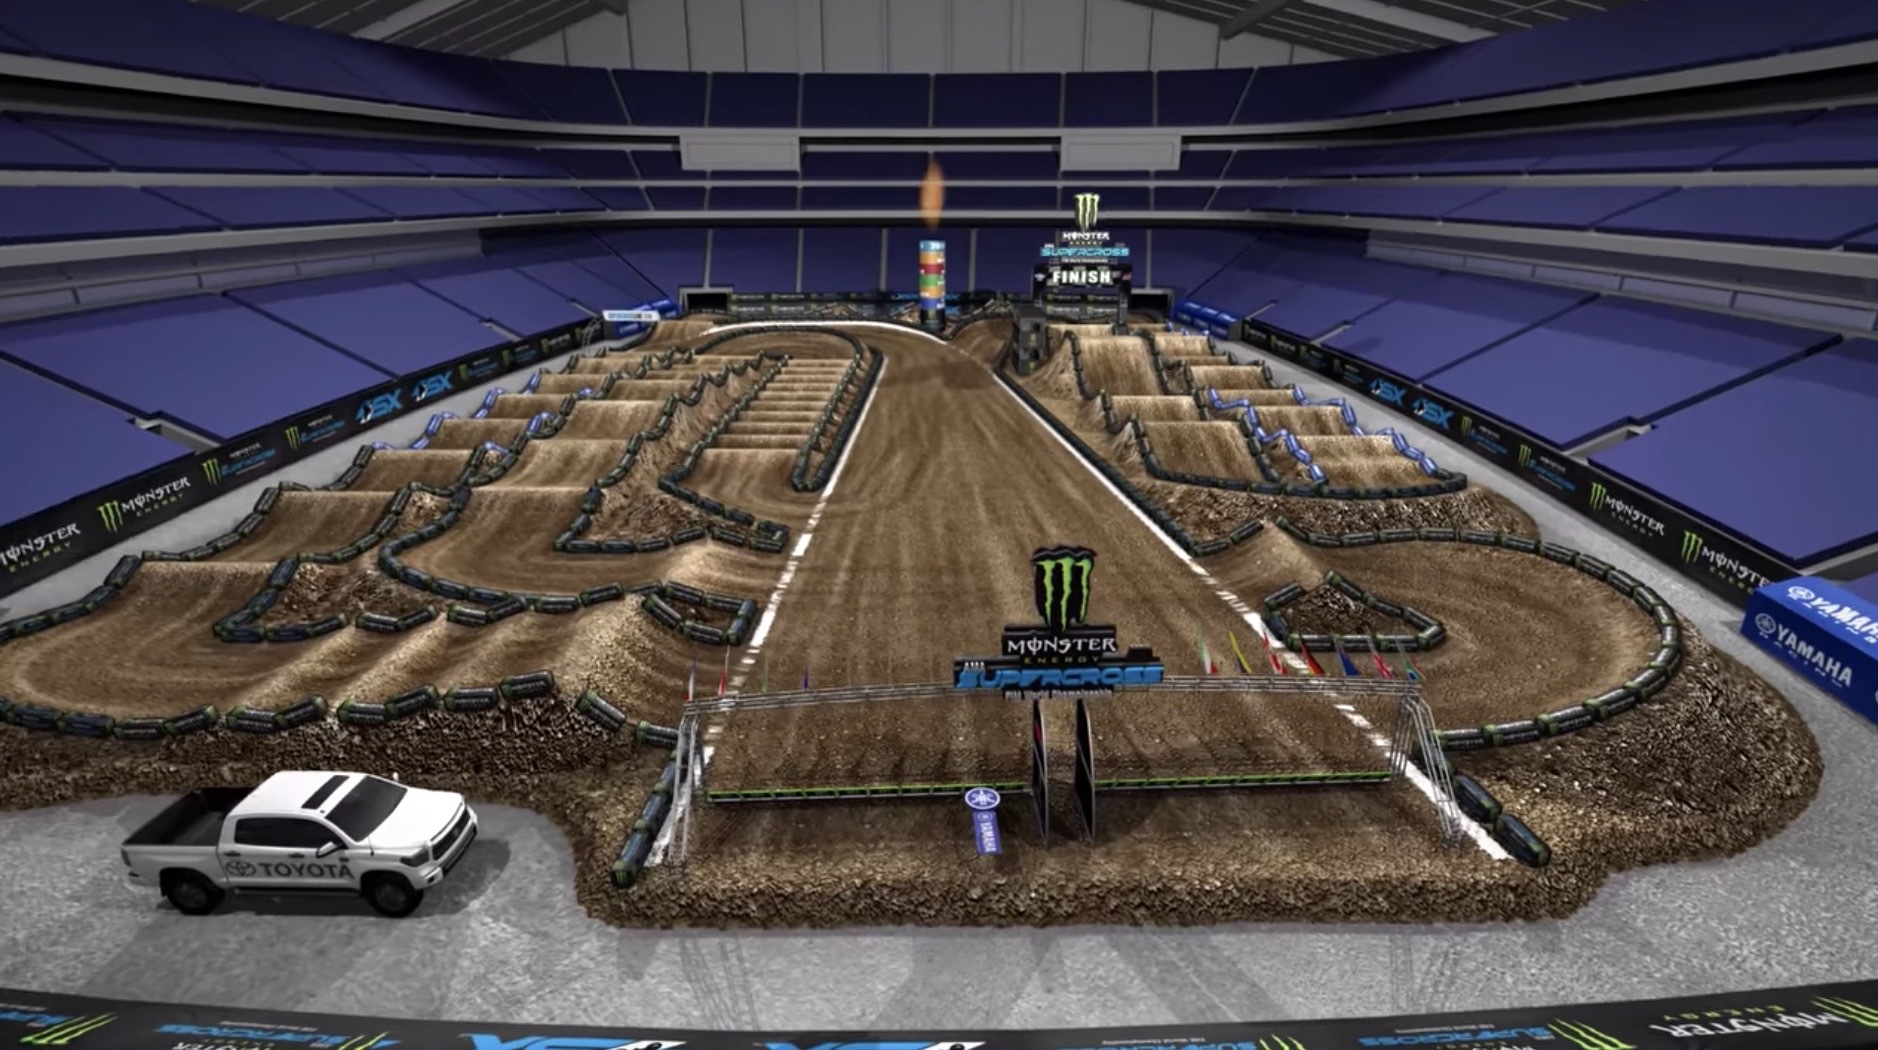 2019 Minneapolis Supercross - Animated Track Map